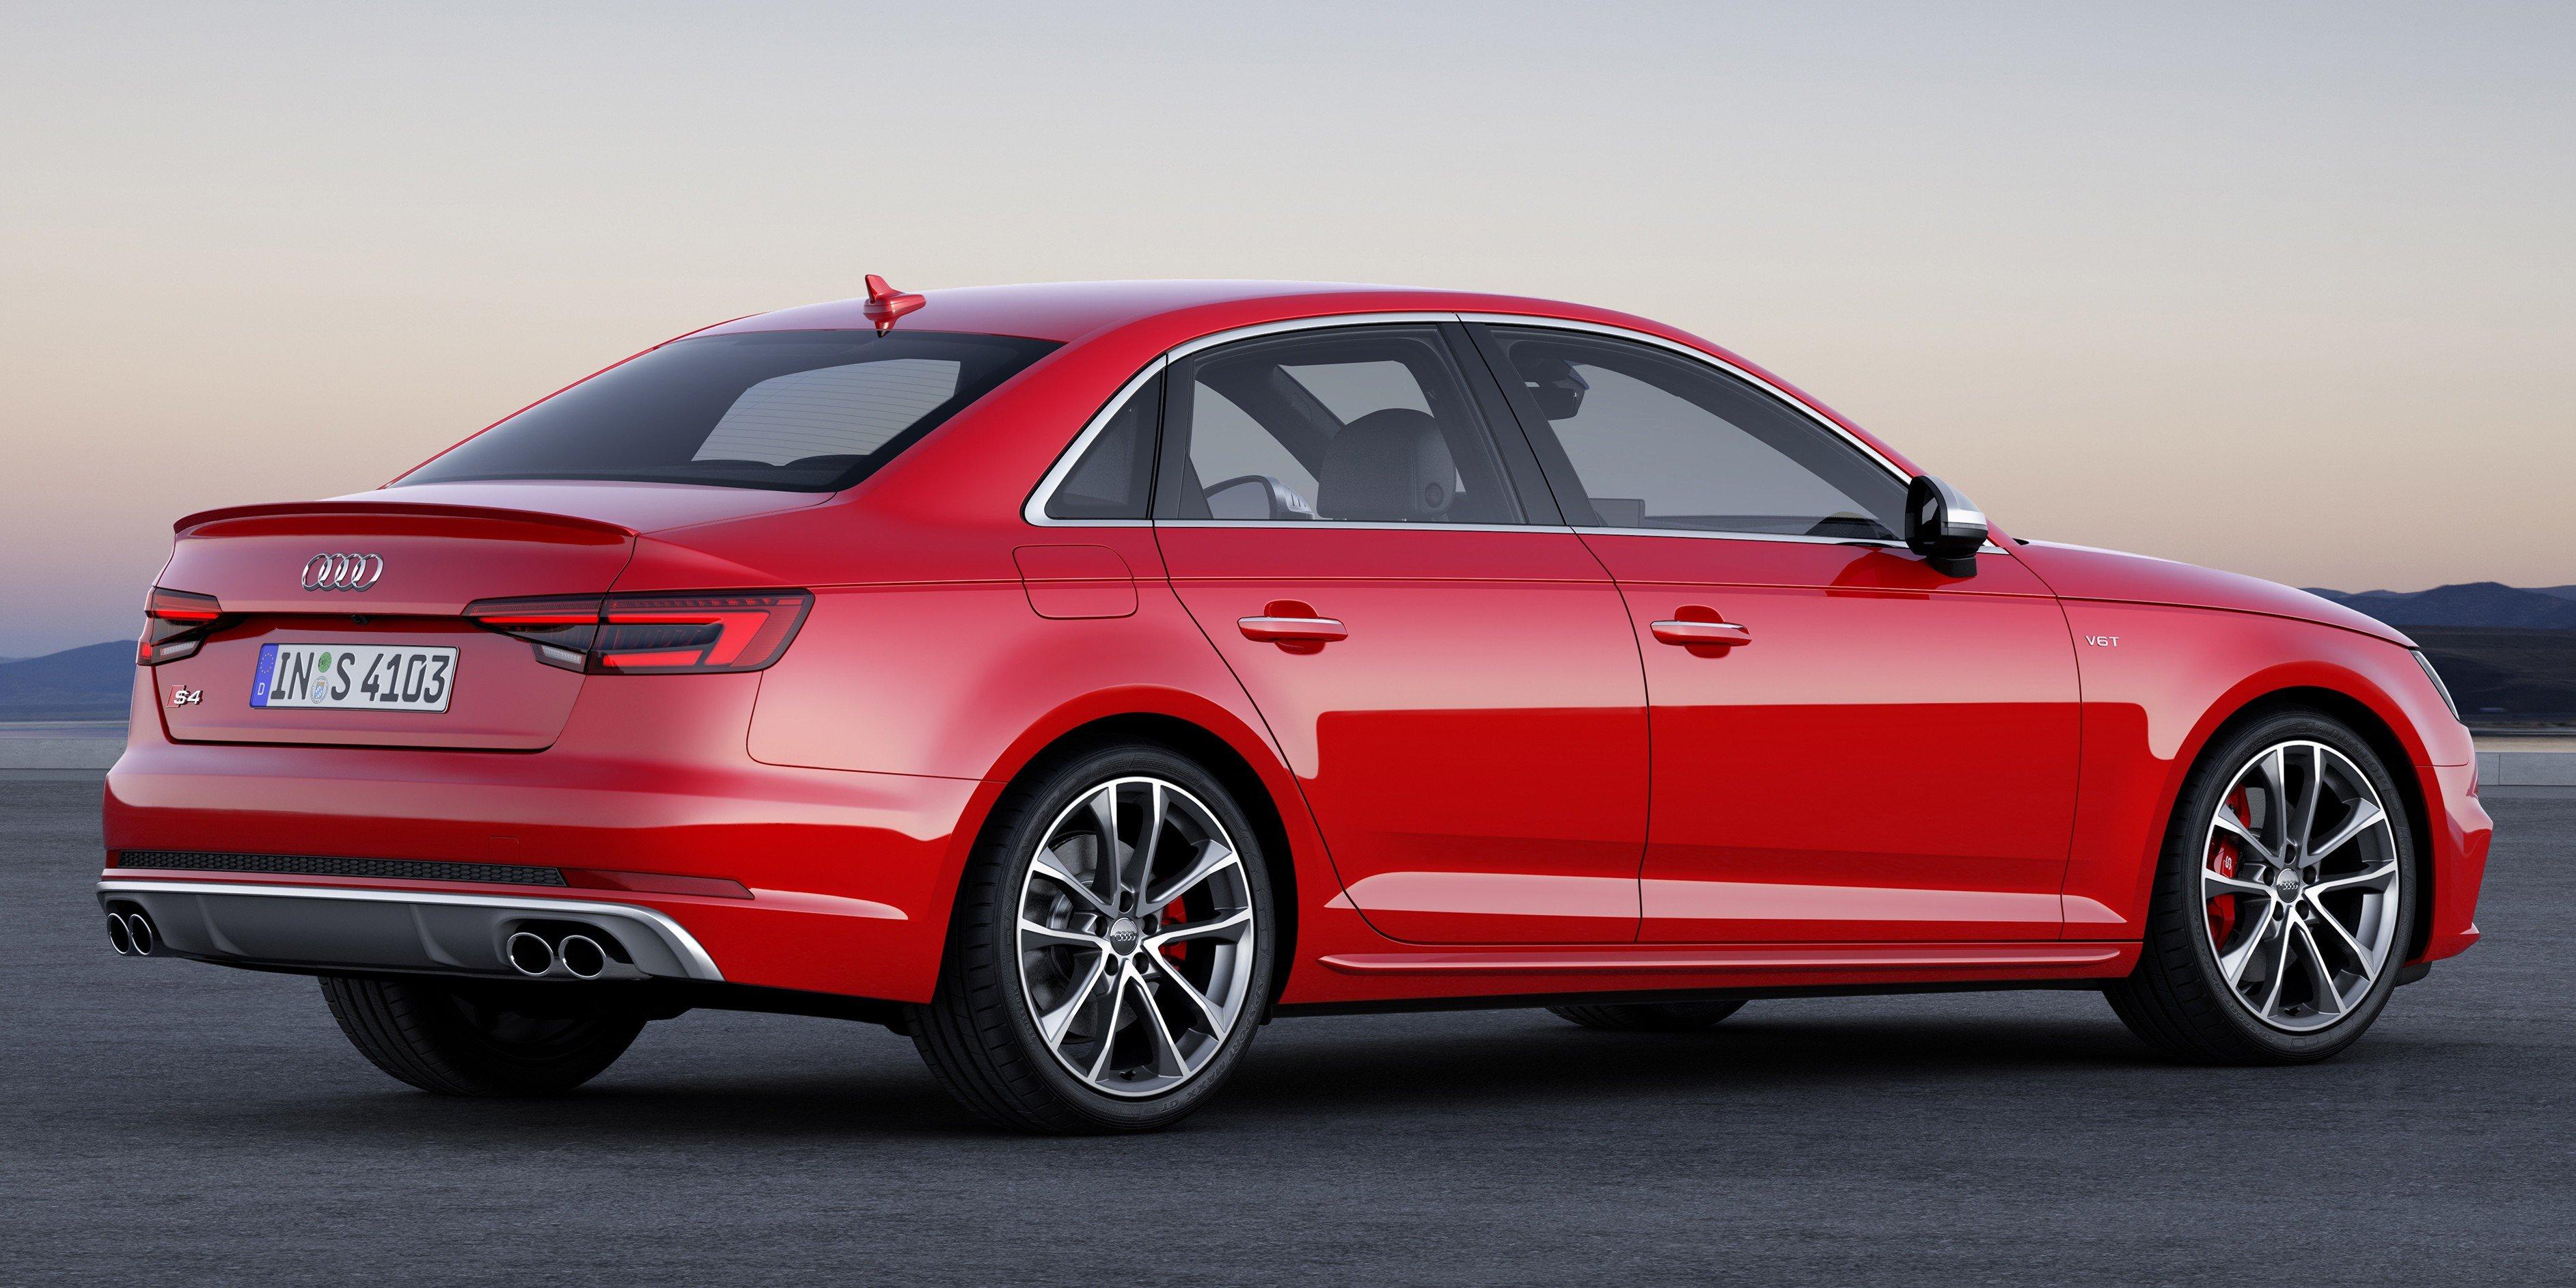 Frankfurt 2015 B9 Audi S4 Revealed Packing 354 Ps Image